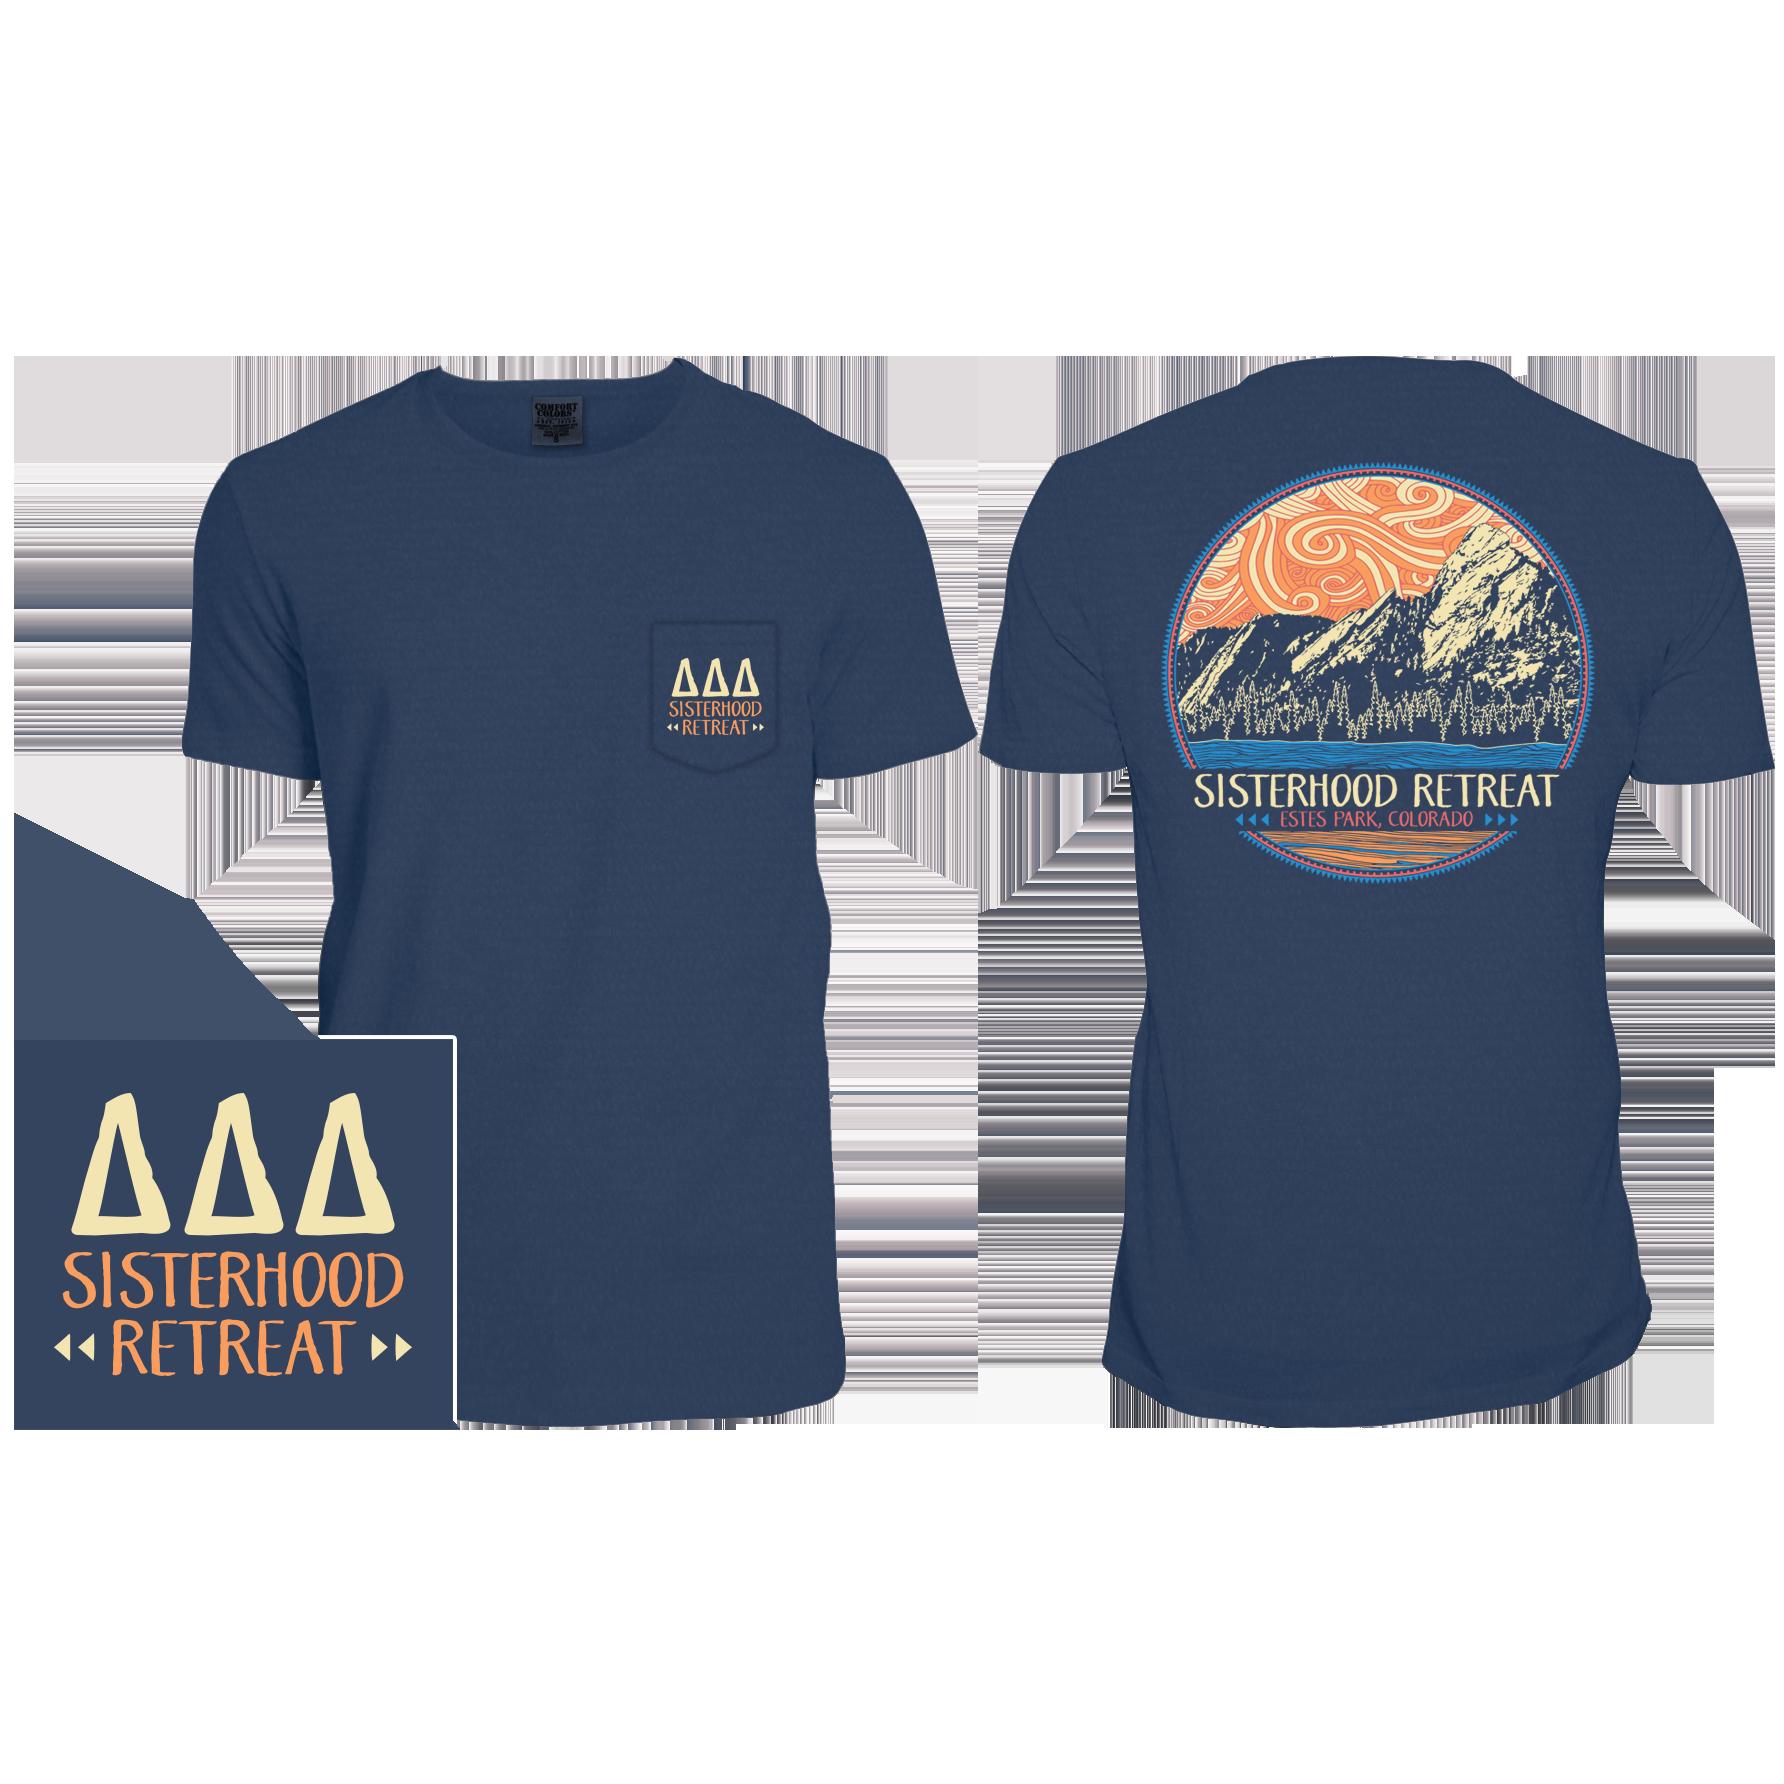 Design t shirt comfort colors - Tri Delta Comfort Colors Sisterhood Retreat Custom Mountain Design By Cornerstone Impressions All Designs Can